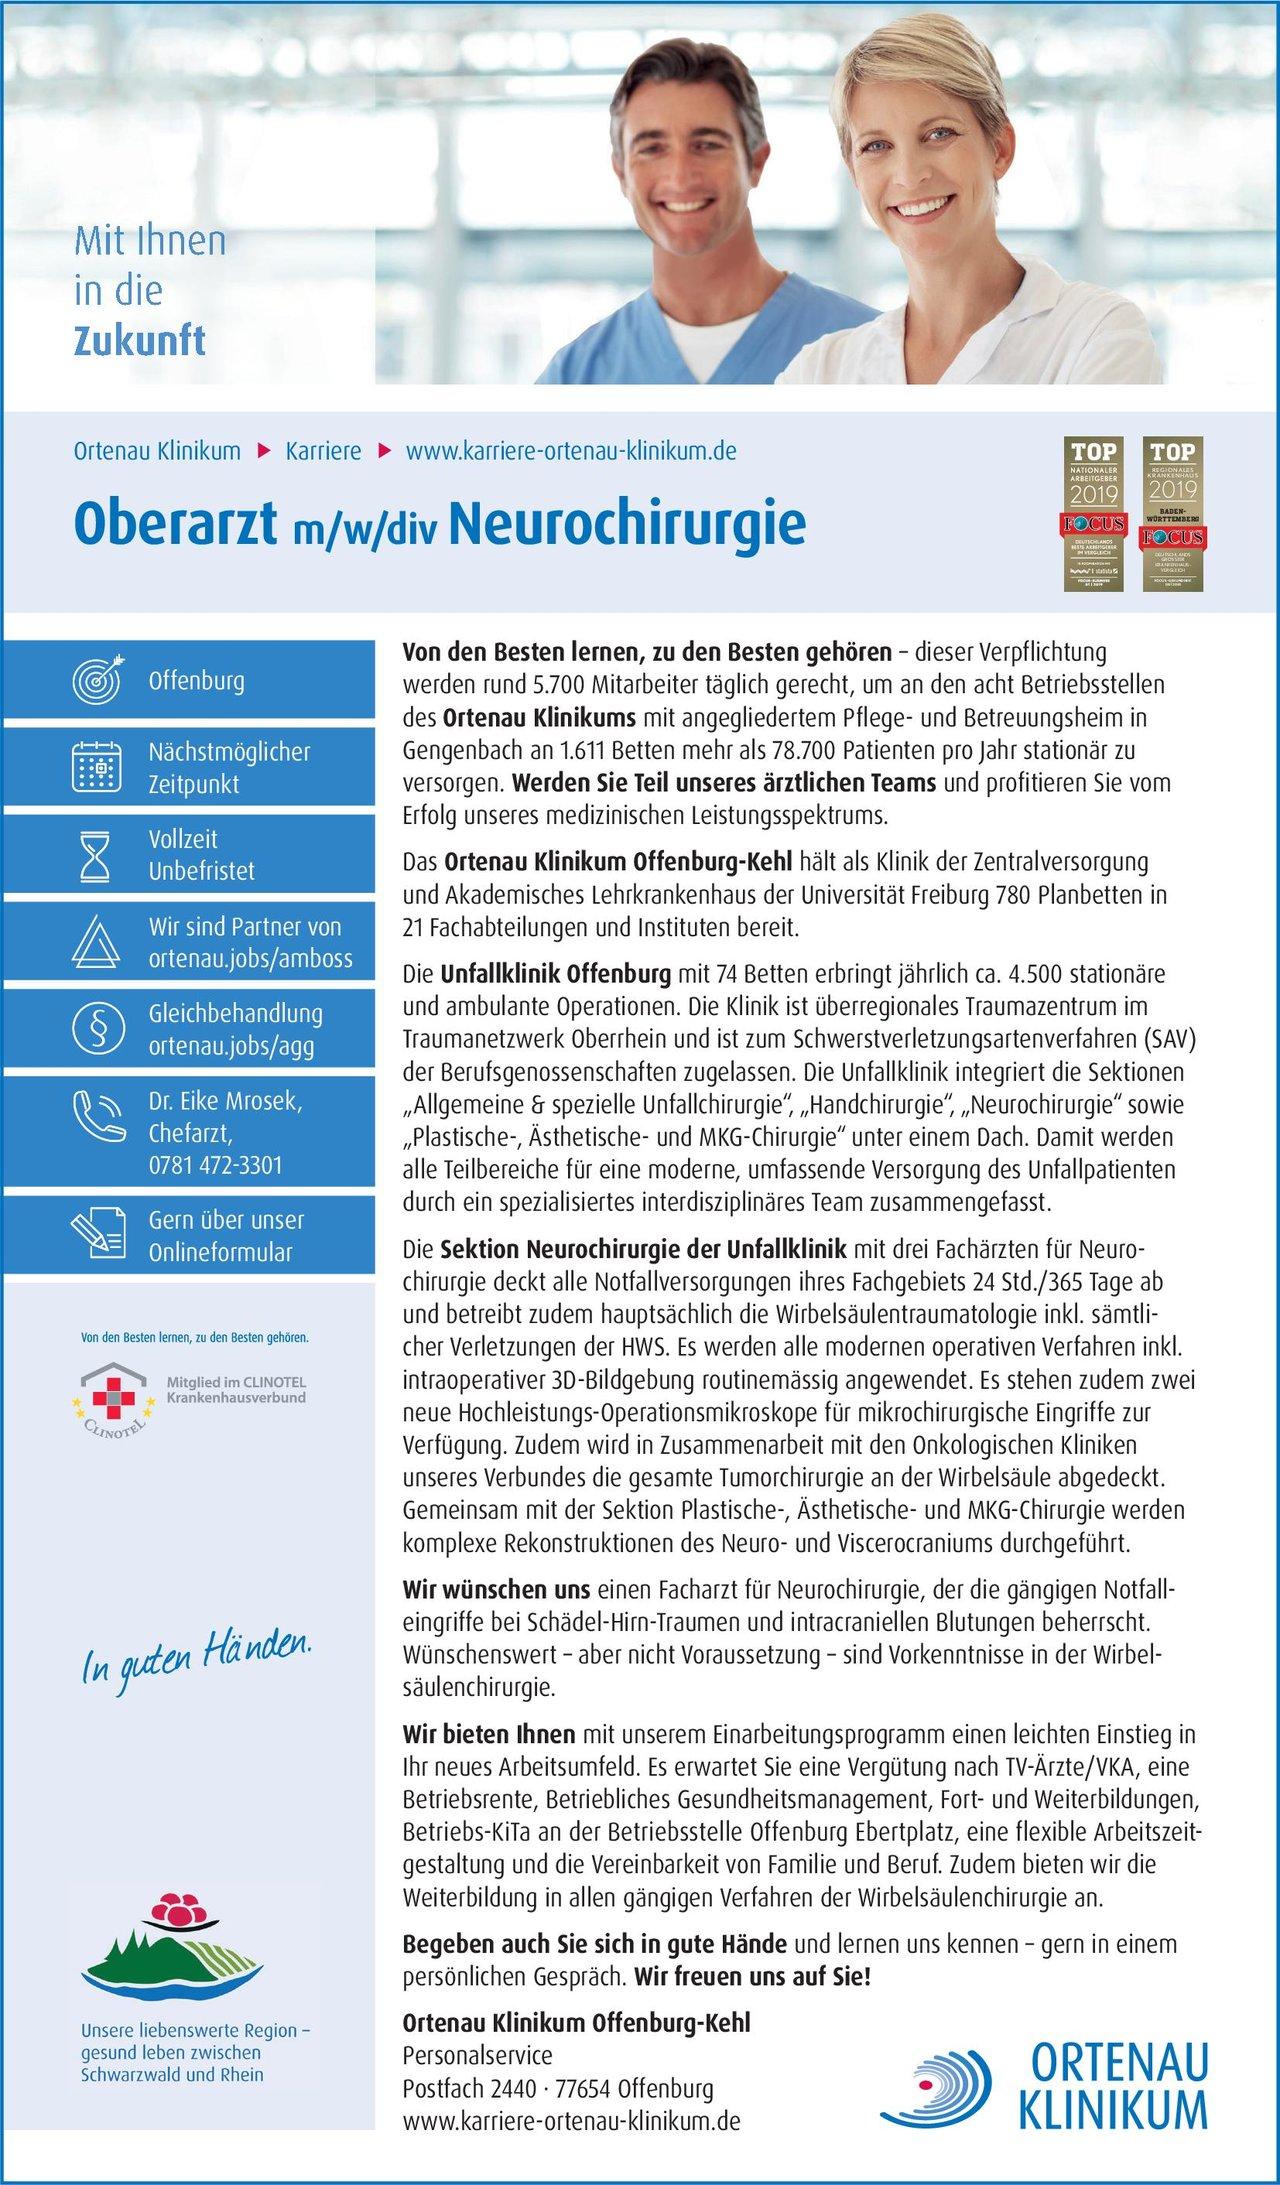 Ortenau Klinikum Offenburg-Kehl Oberarzt m/w/div Neurochirurgie Neurochirurgie Oberarzt